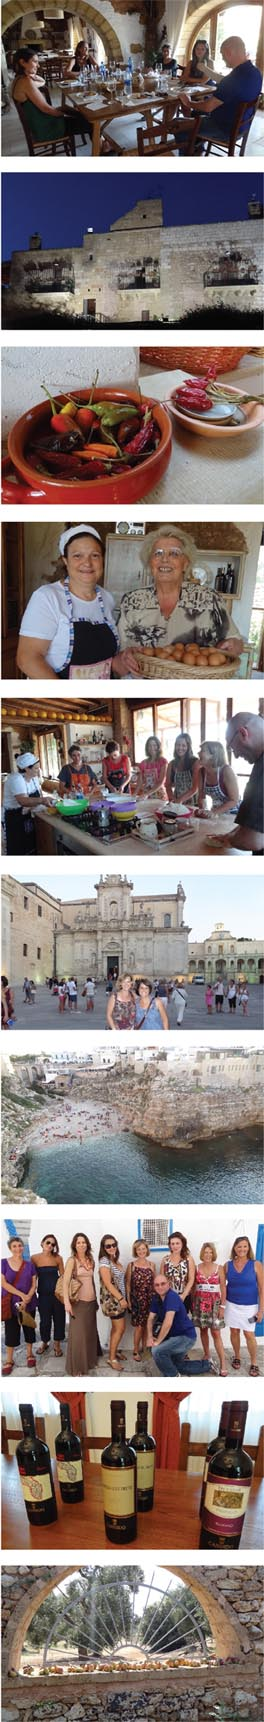 italian-language-program-puglia-2013